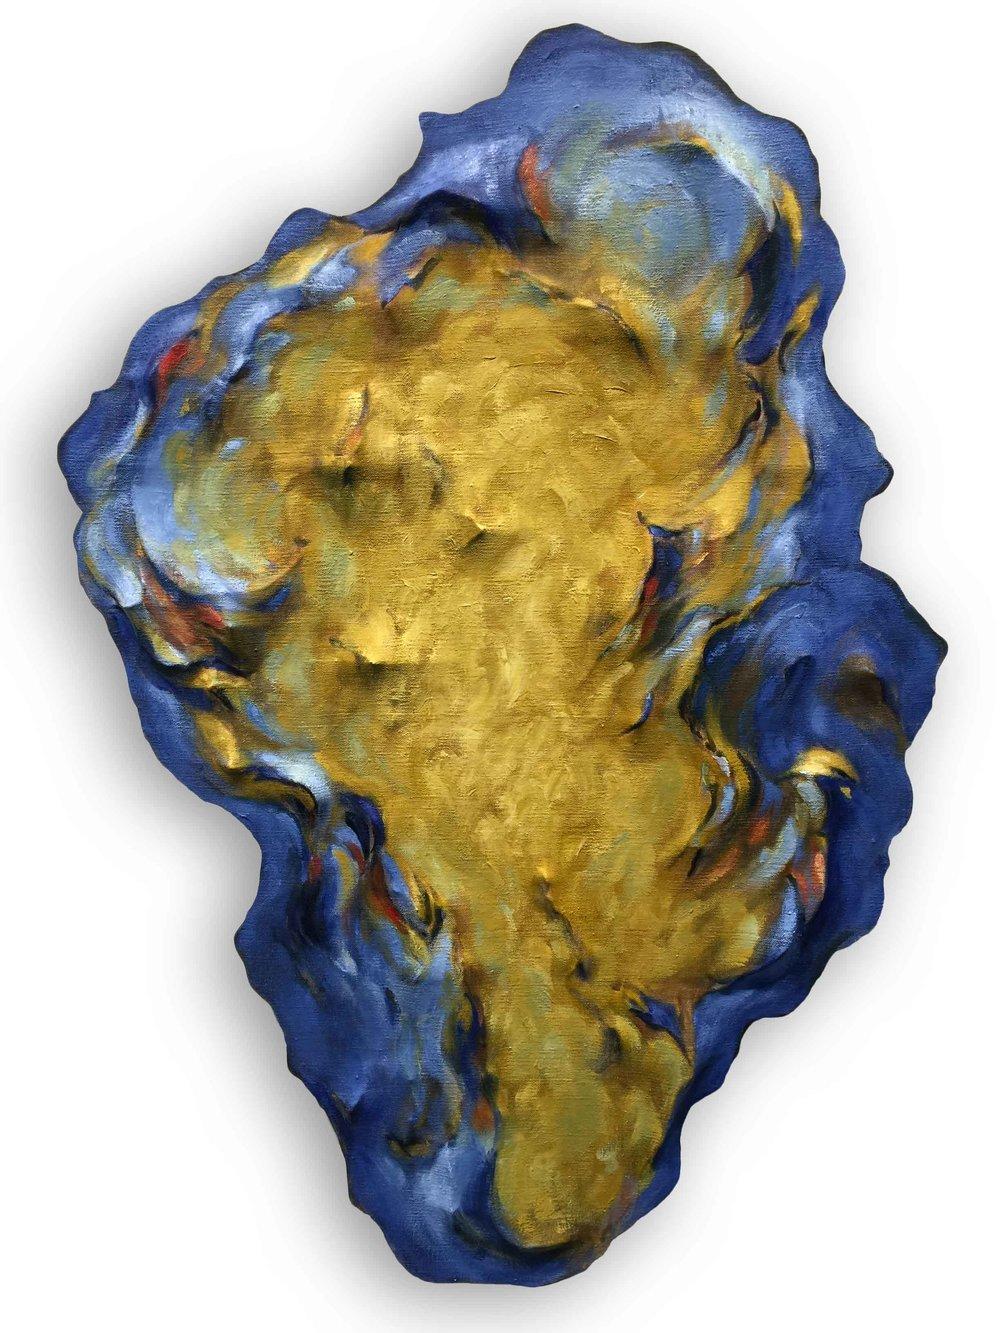 Untitled (Ochre and Cobalt Blue)